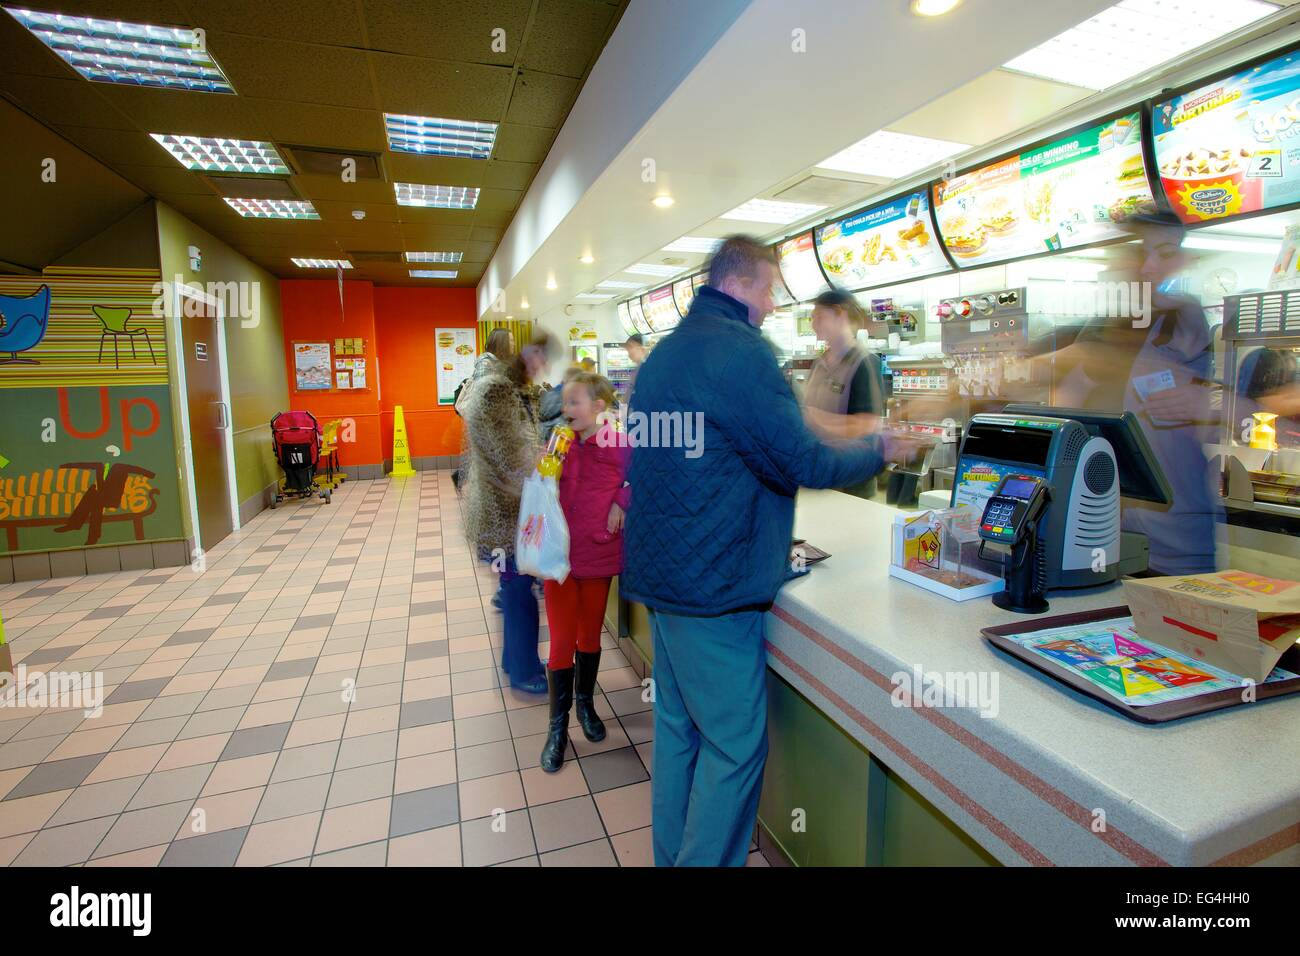 Customers at counter. McDonalds restaurant interior. - Stock Image